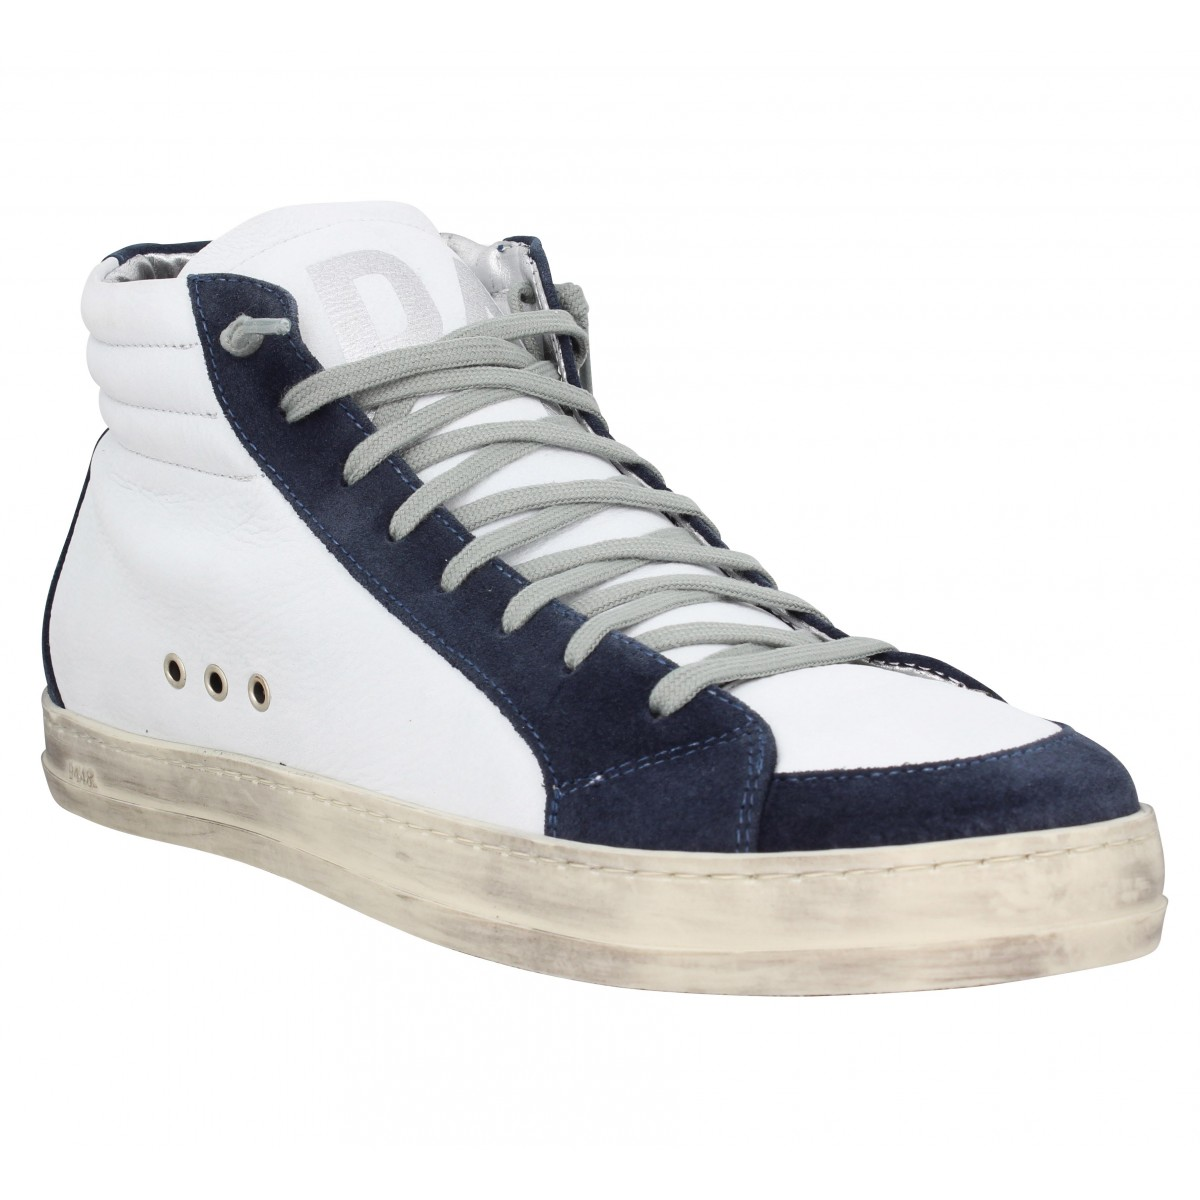 P448 Homme Skate Cuir Velours -40-blanc...